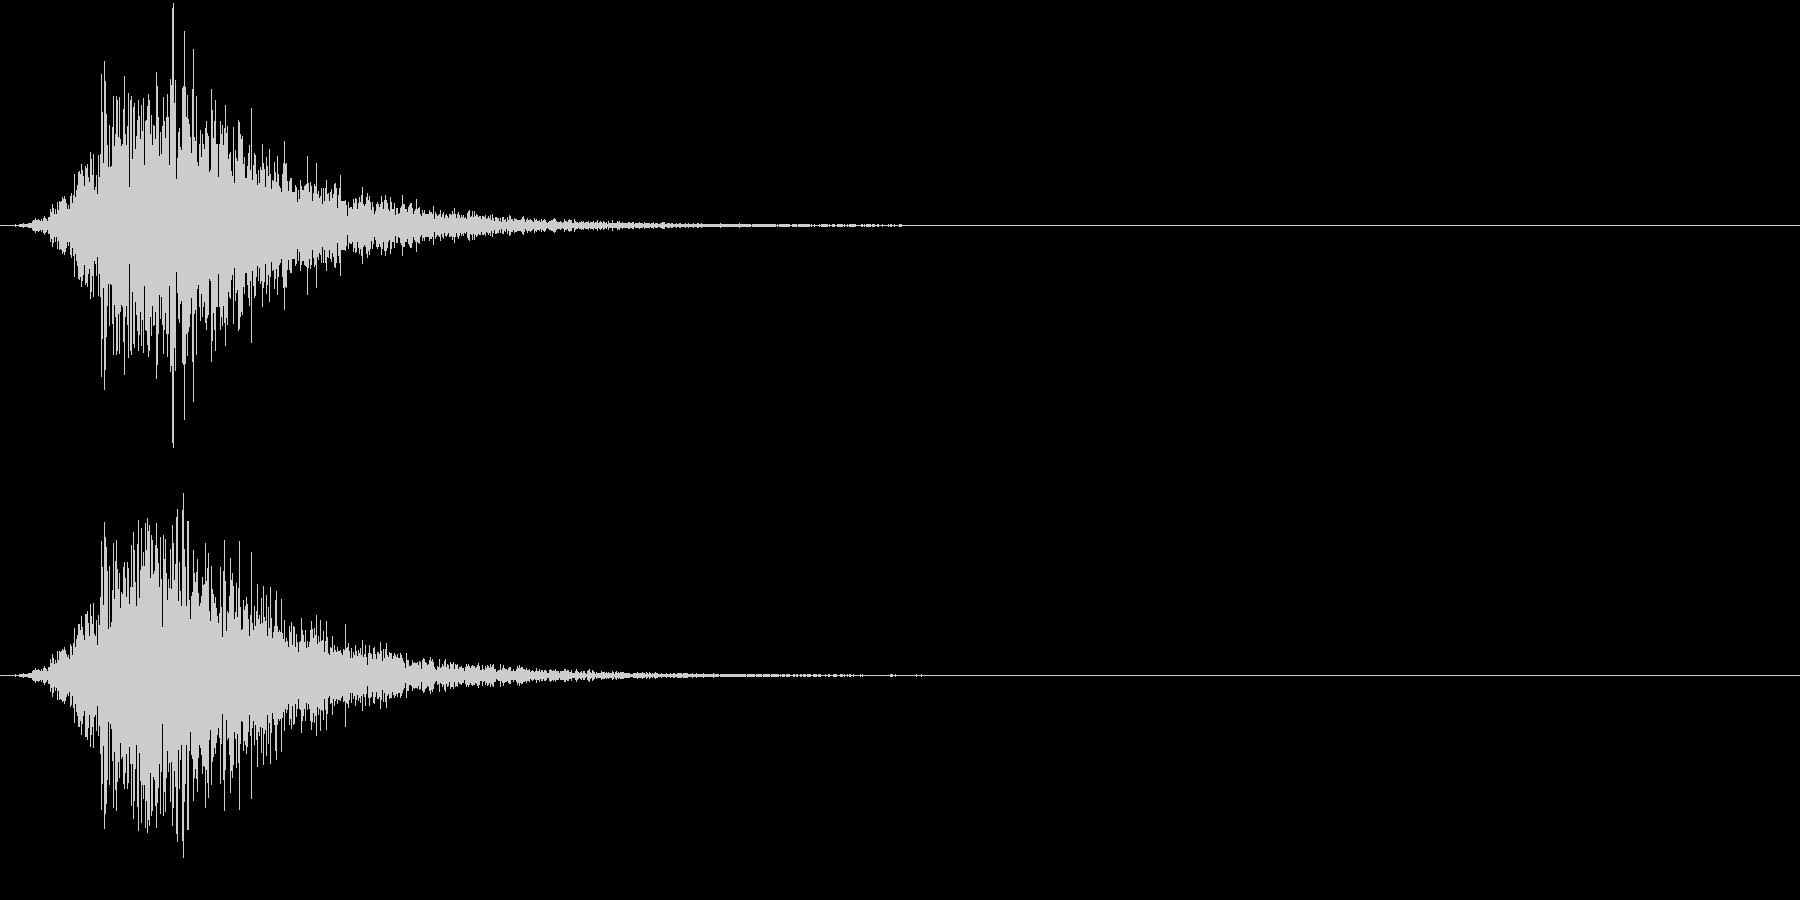 Battle 戦闘エフェクト音 7の未再生の波形